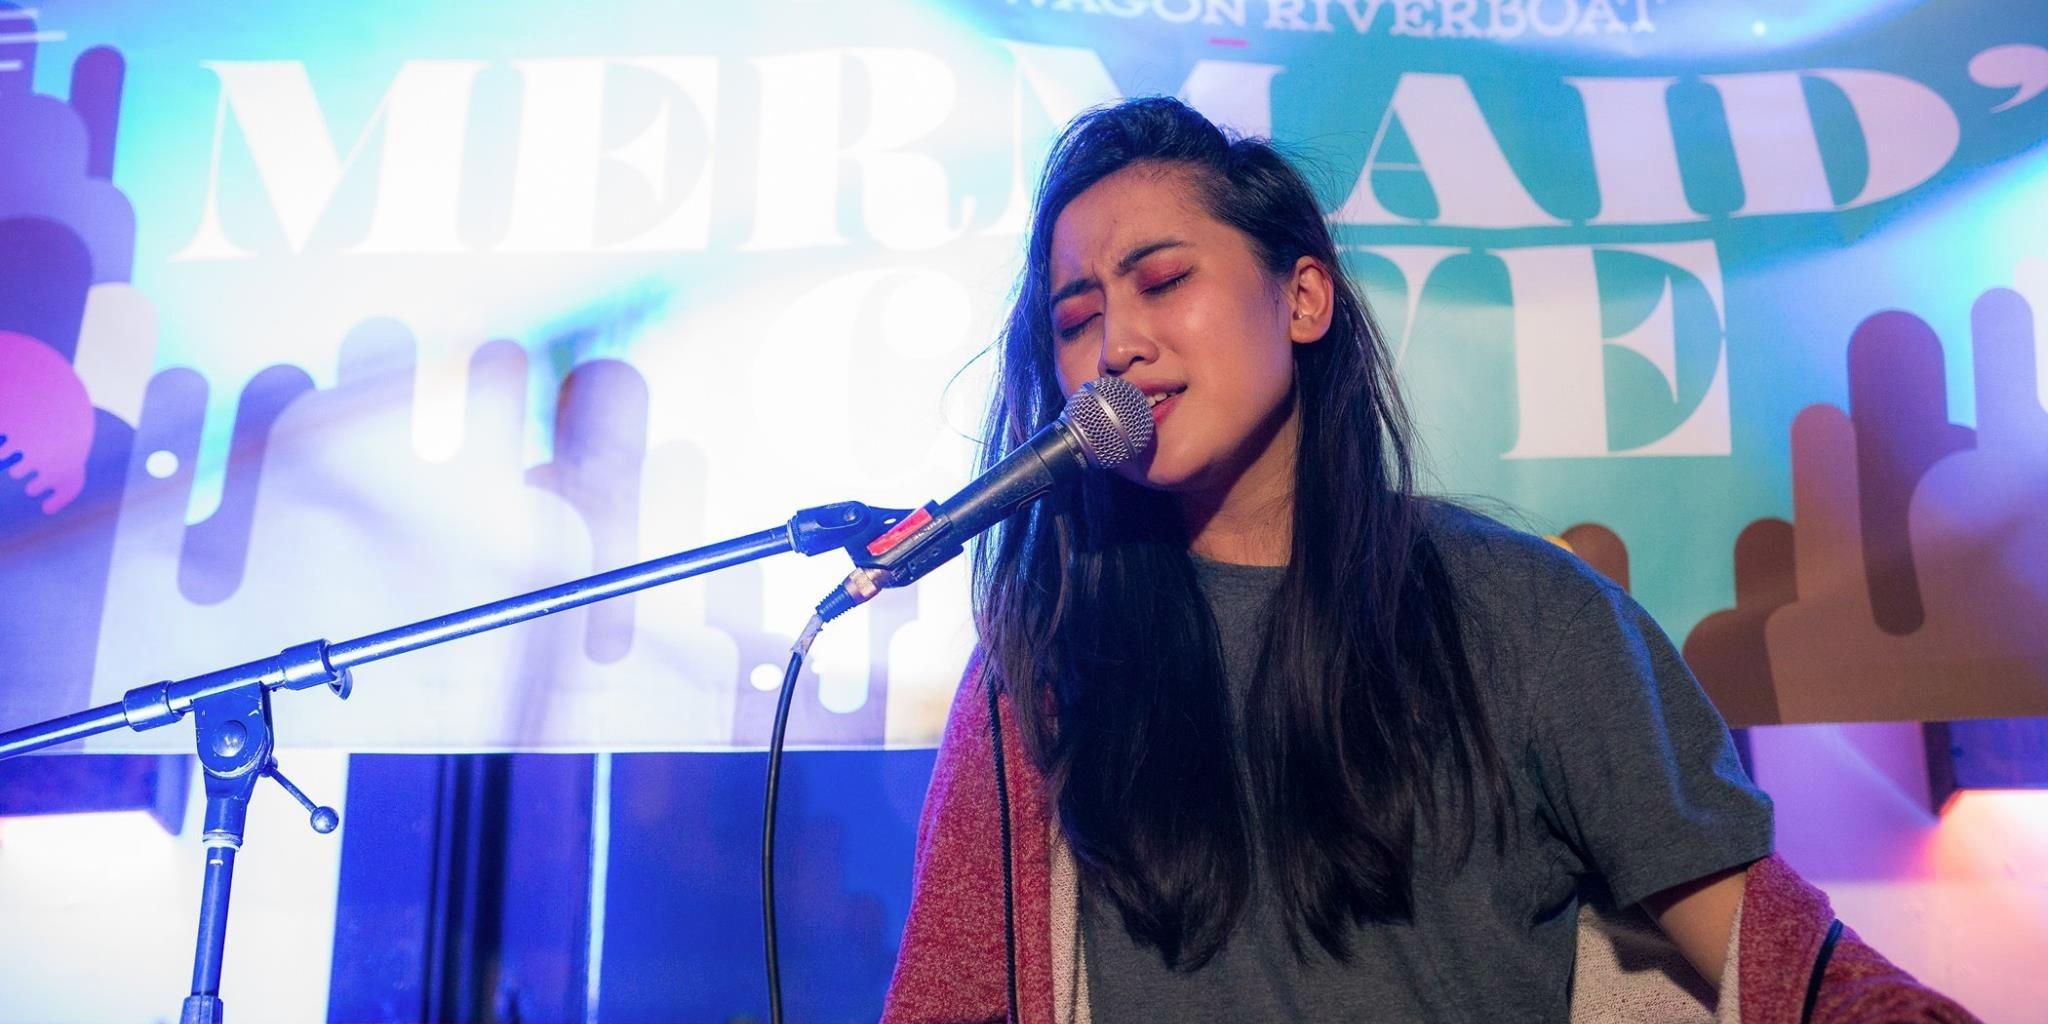 BP Valenzuela announces sophomore album Crydancer and upcoming single